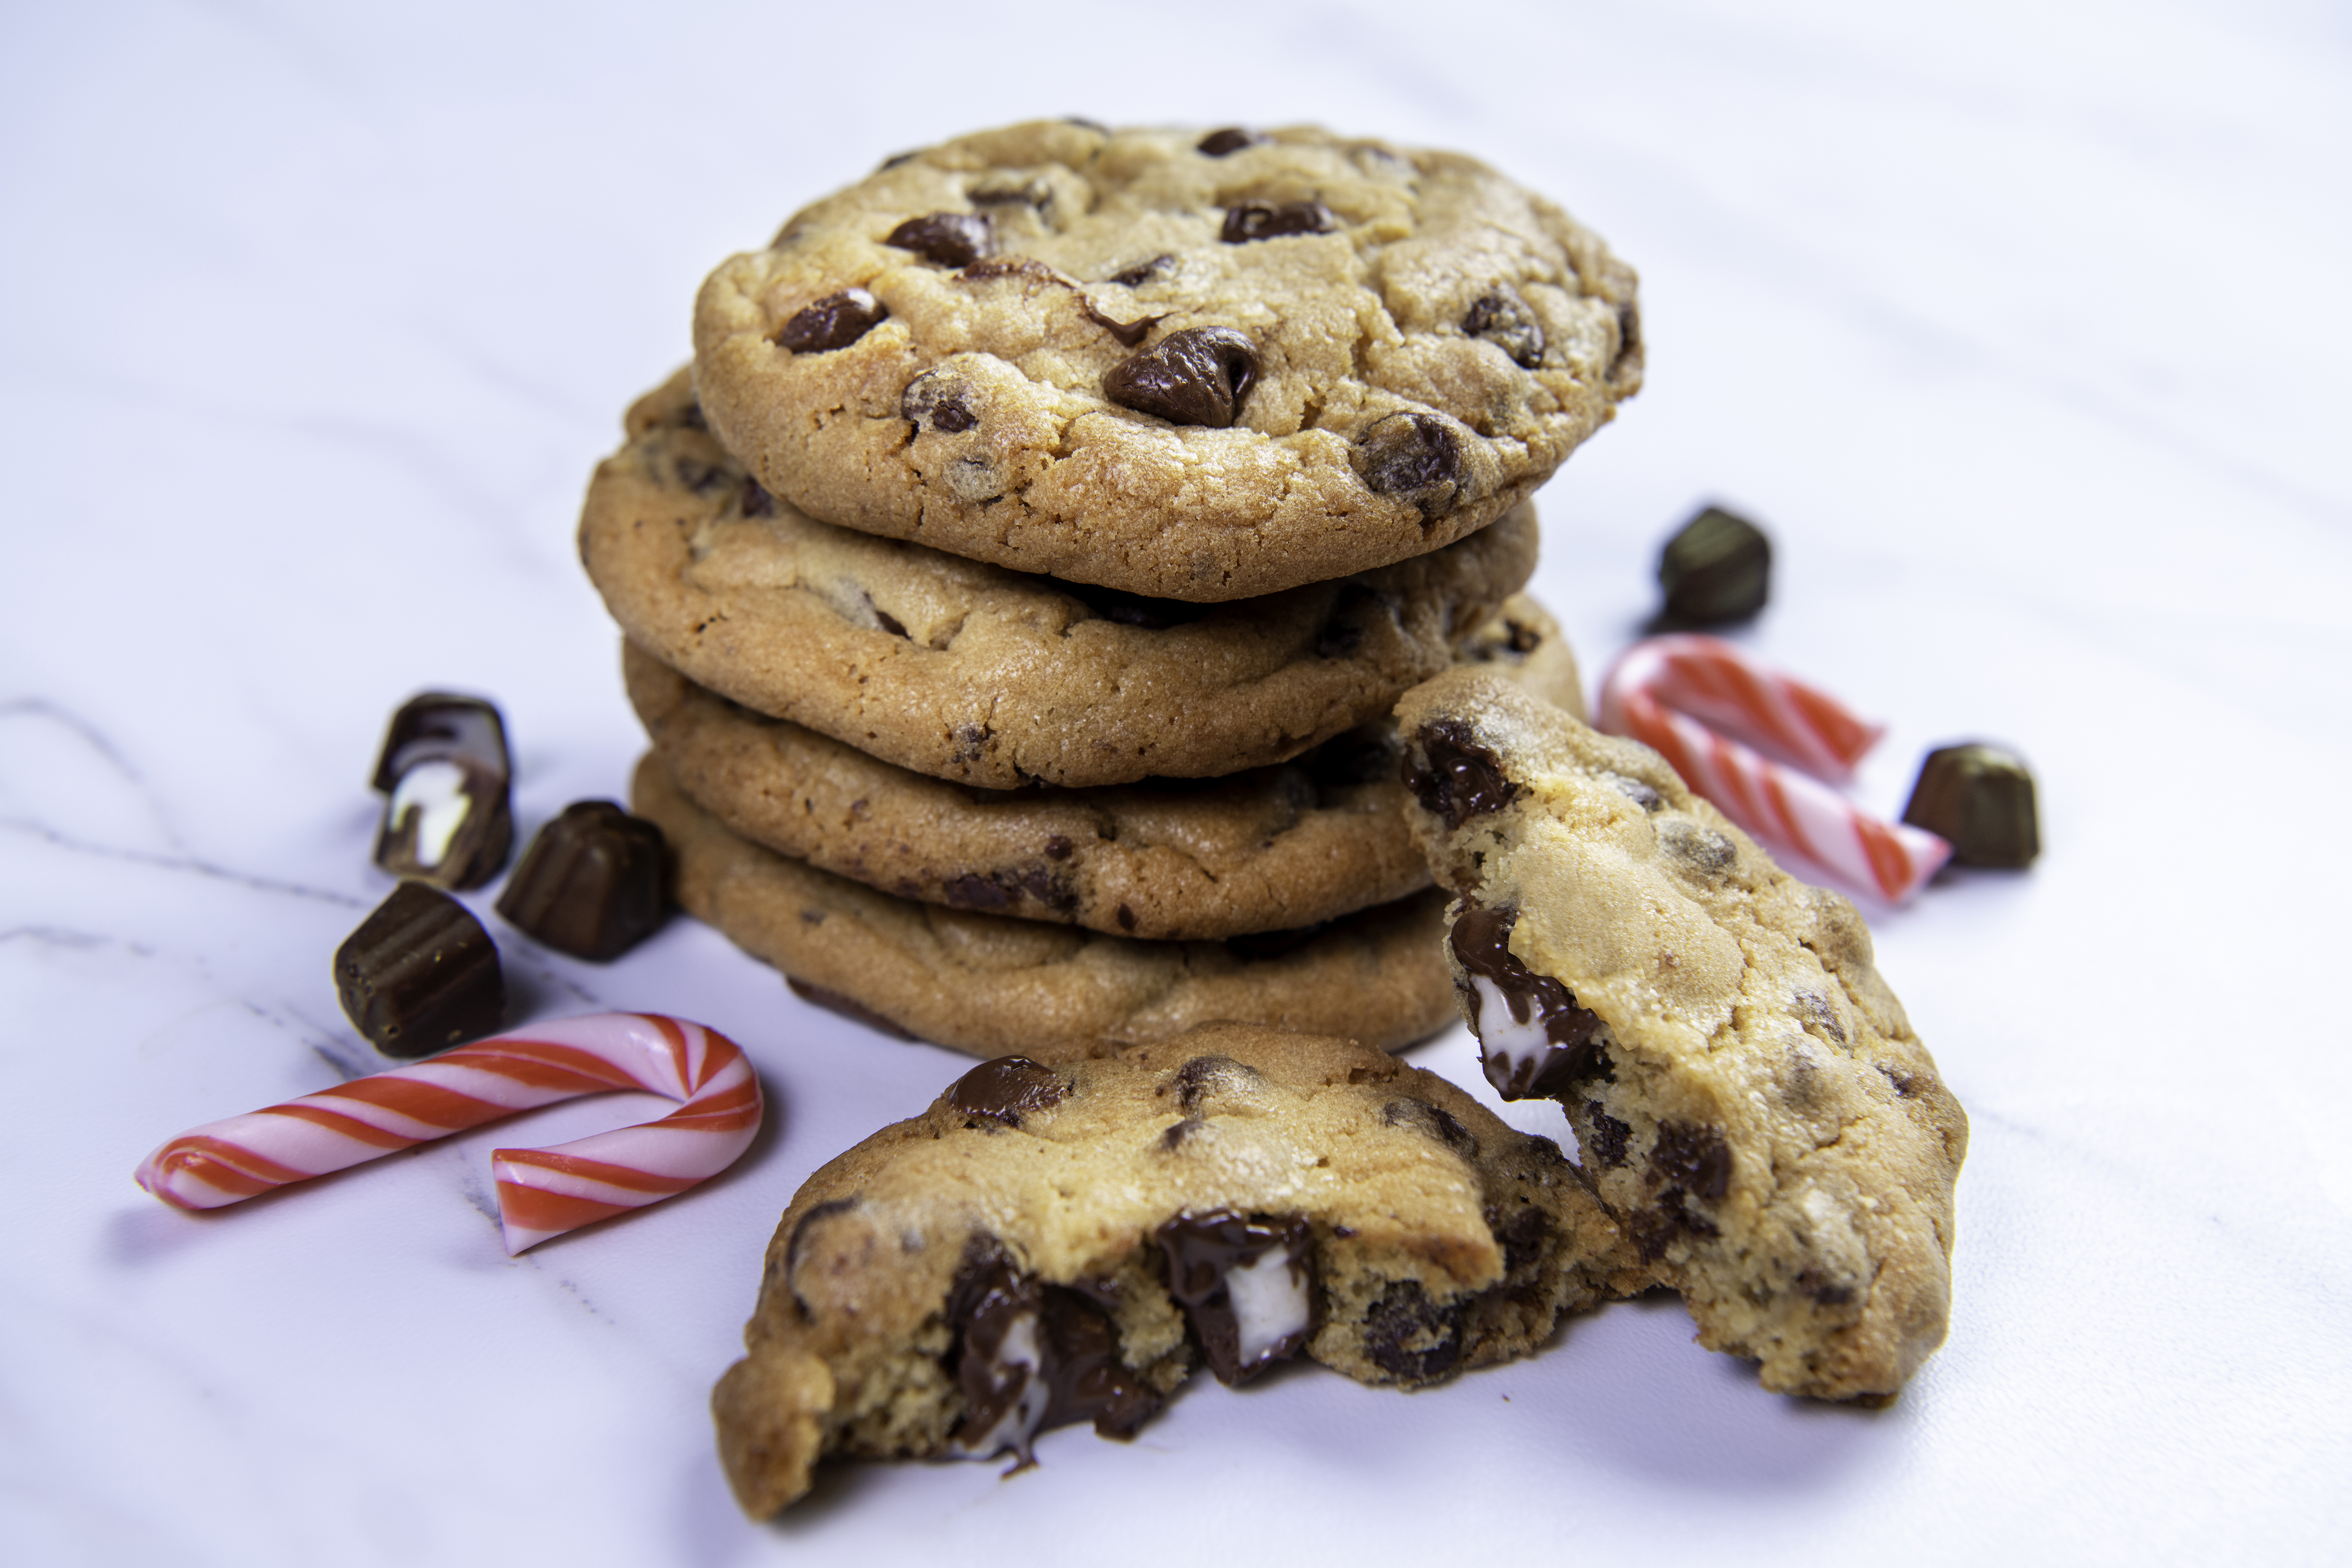 Mint Candy Stuffed Cookies